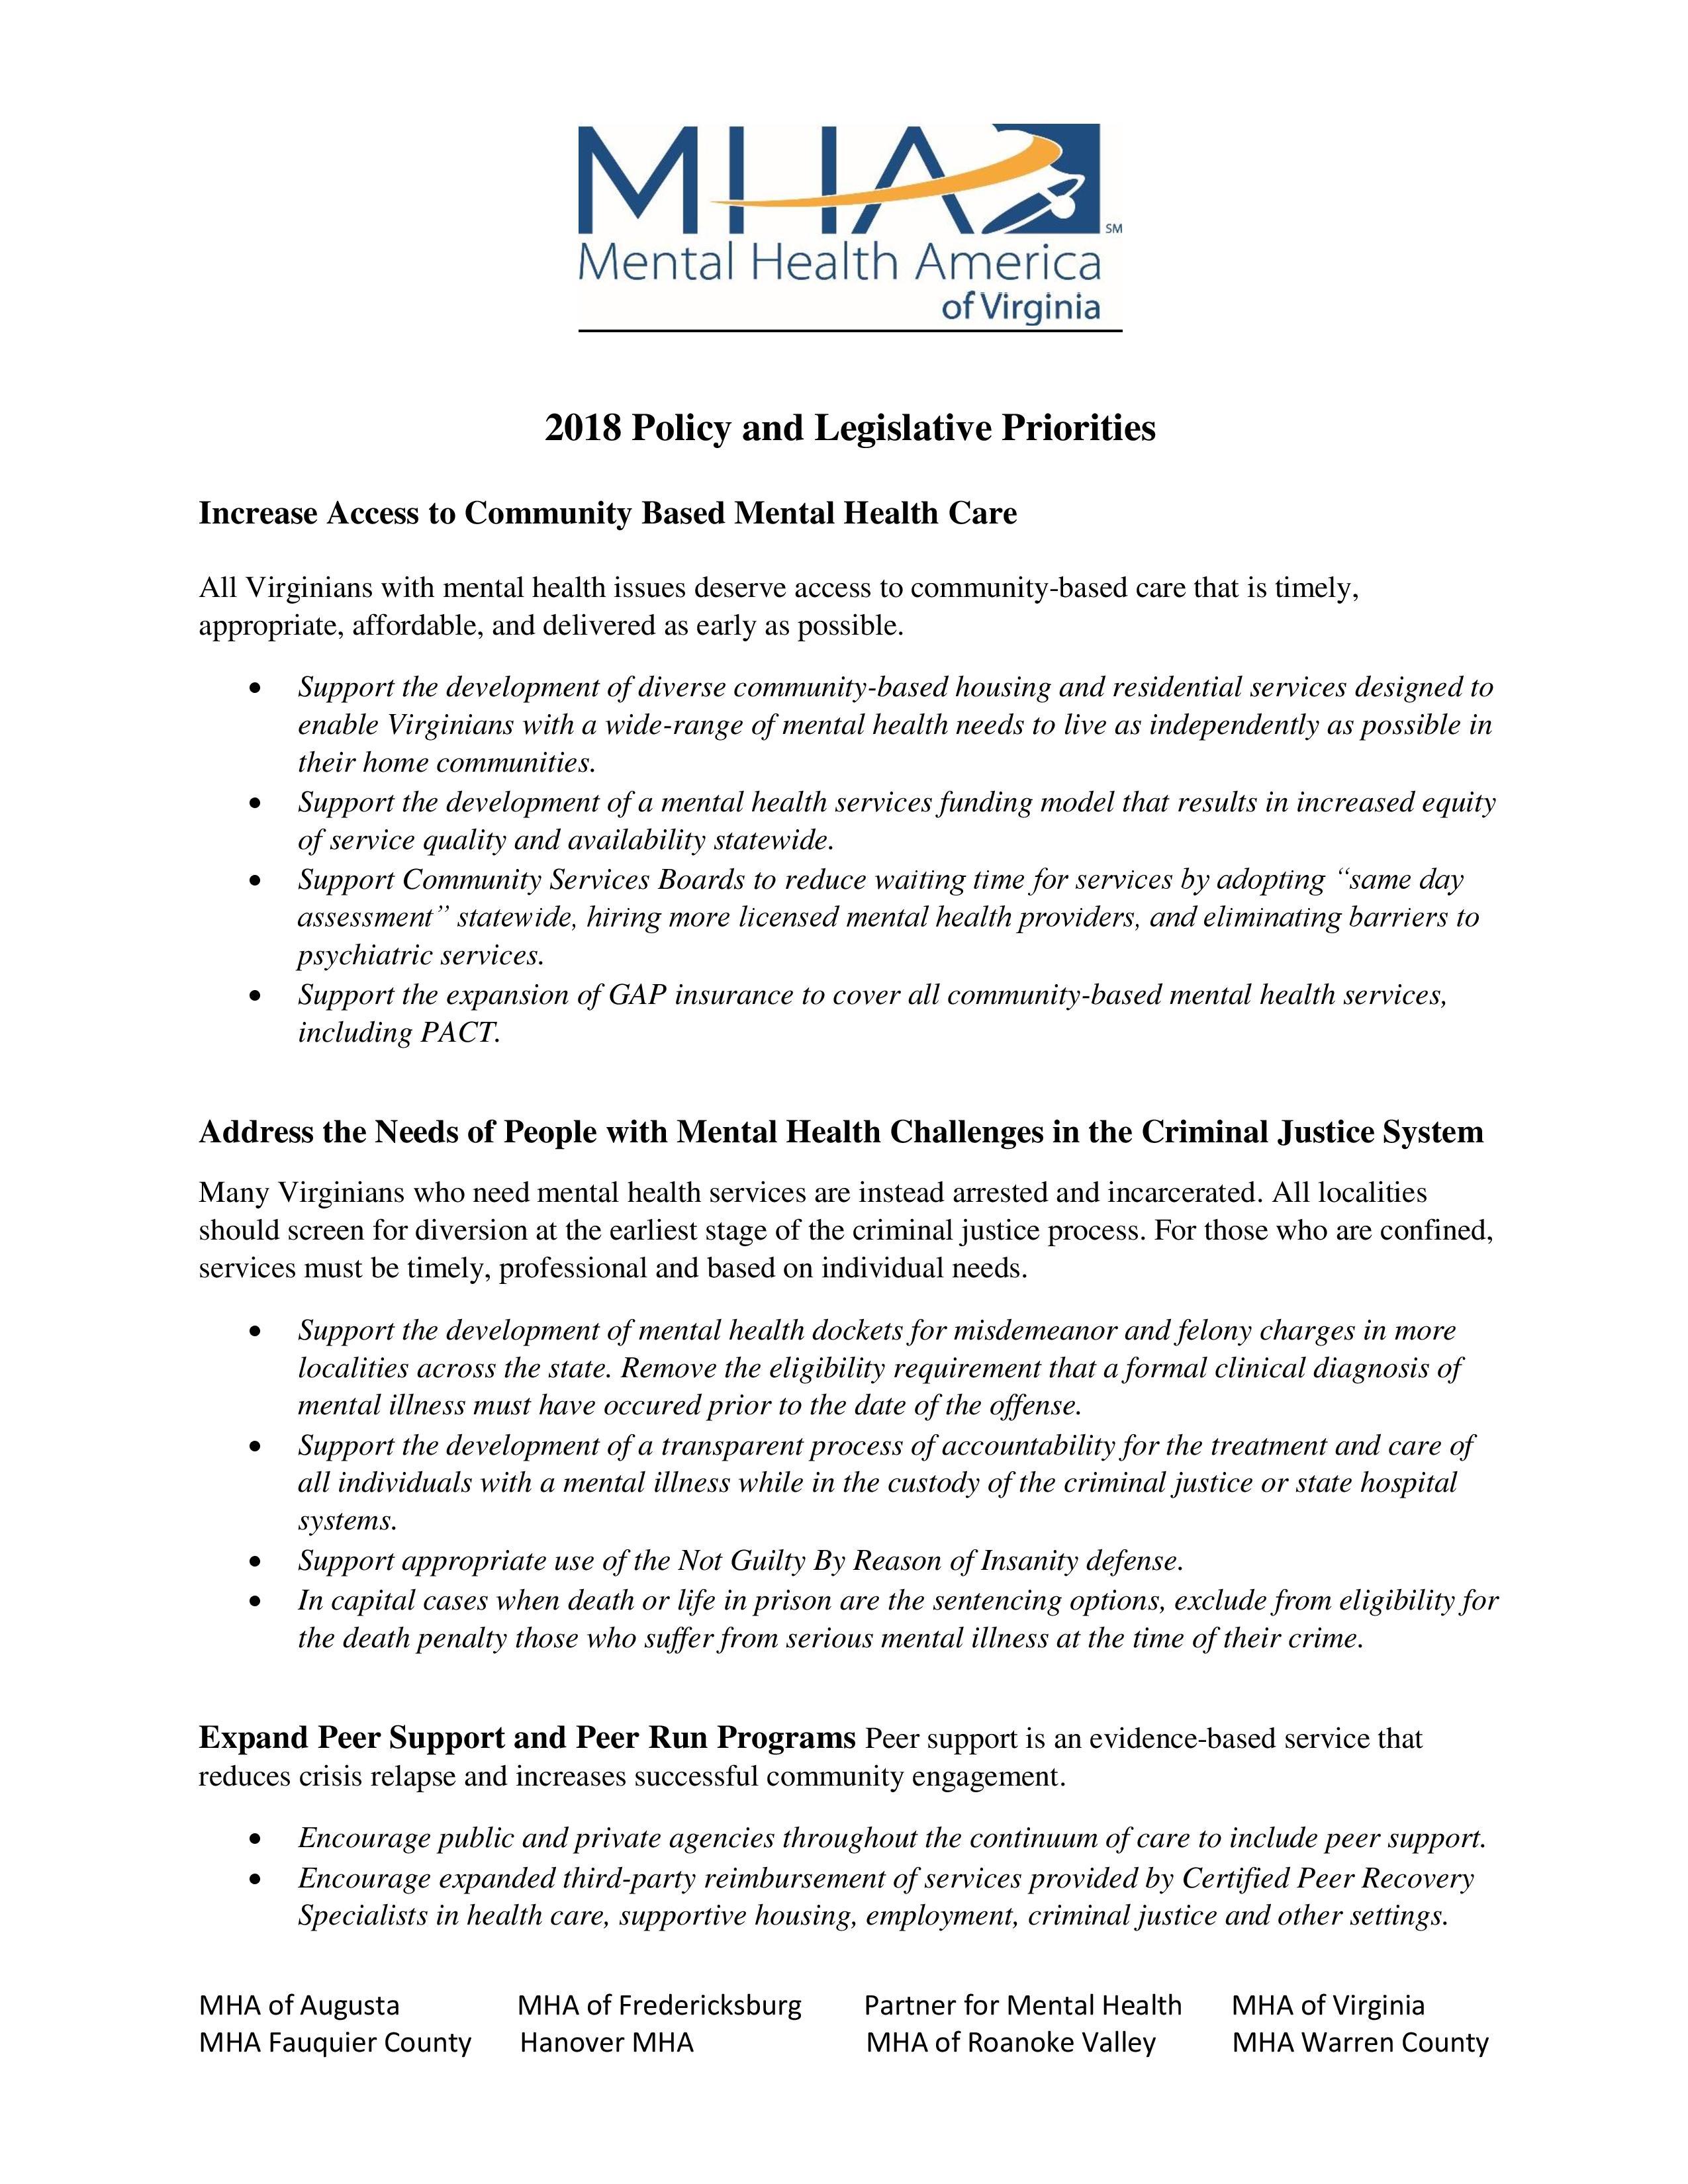 Advocacy Mental Health America Of Virginia